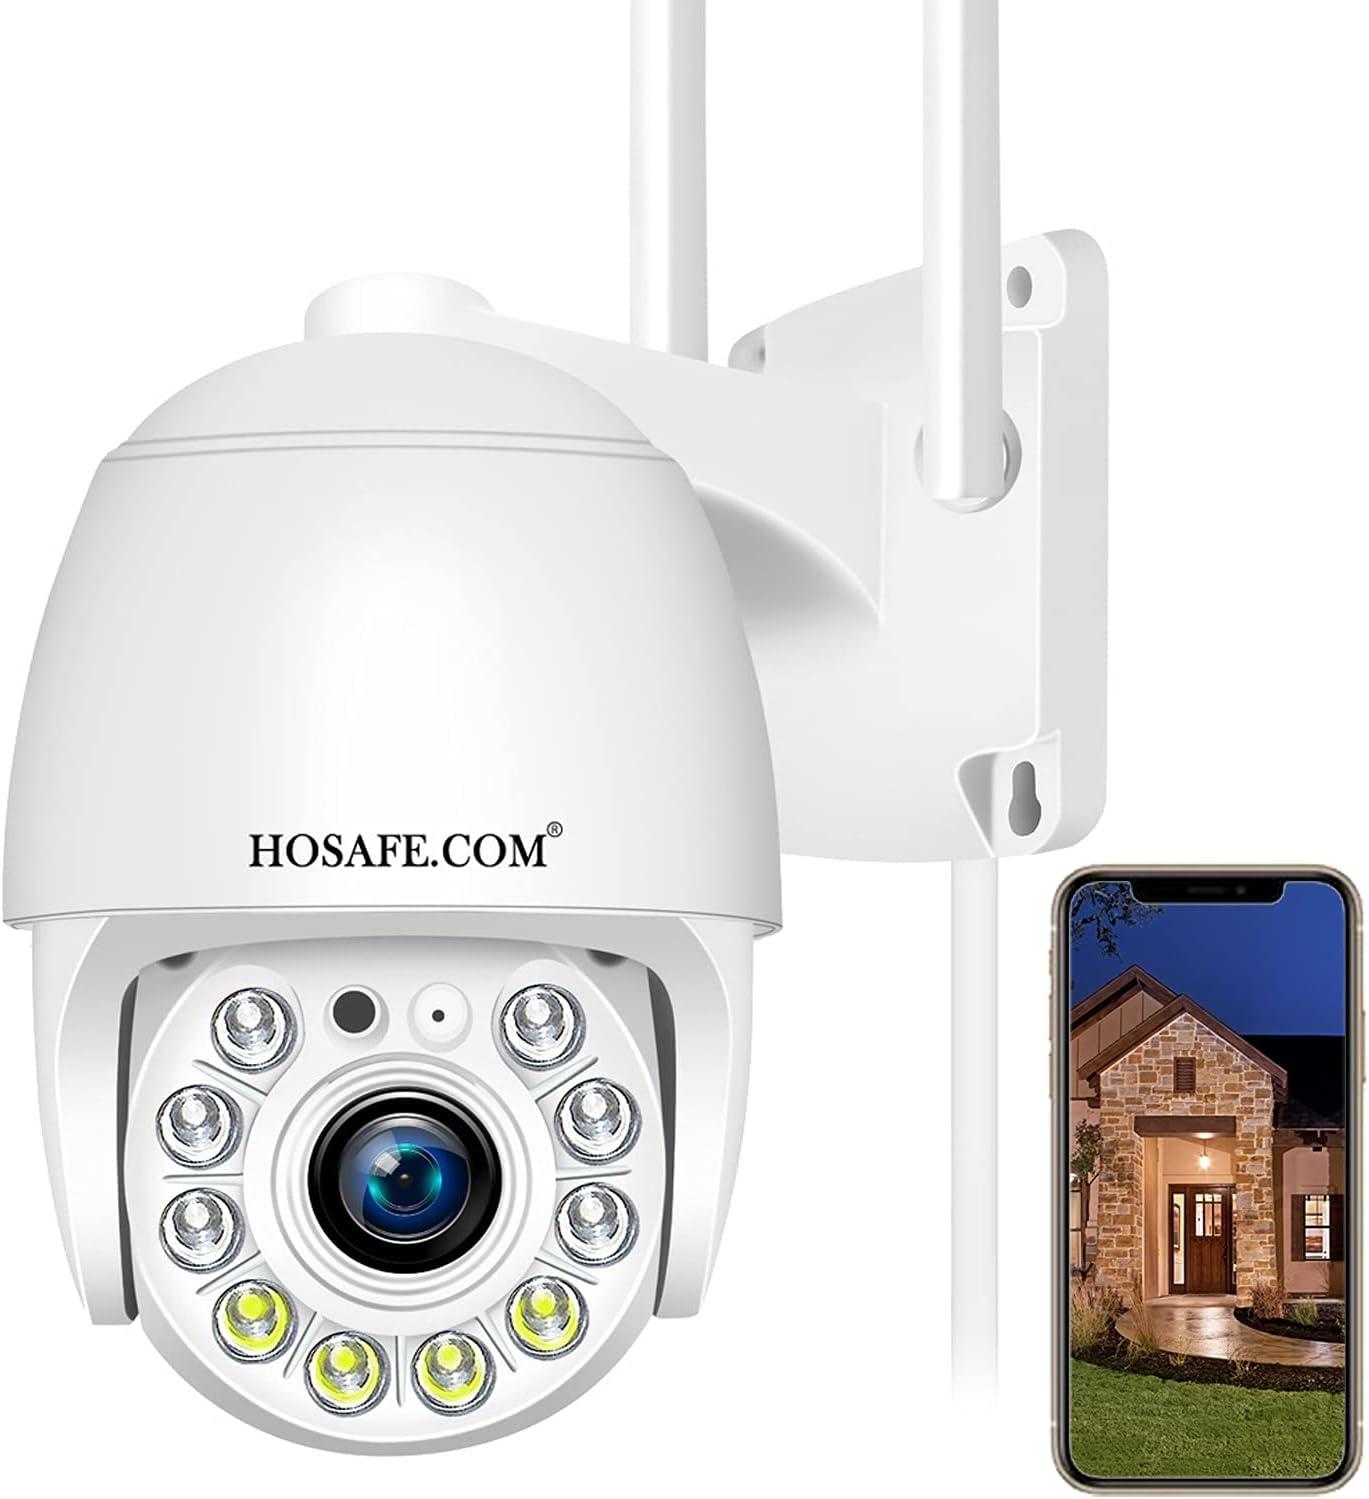 HOSAFE.COM Wireless WiFi Security Camera Outdoor $39.99 Coupon